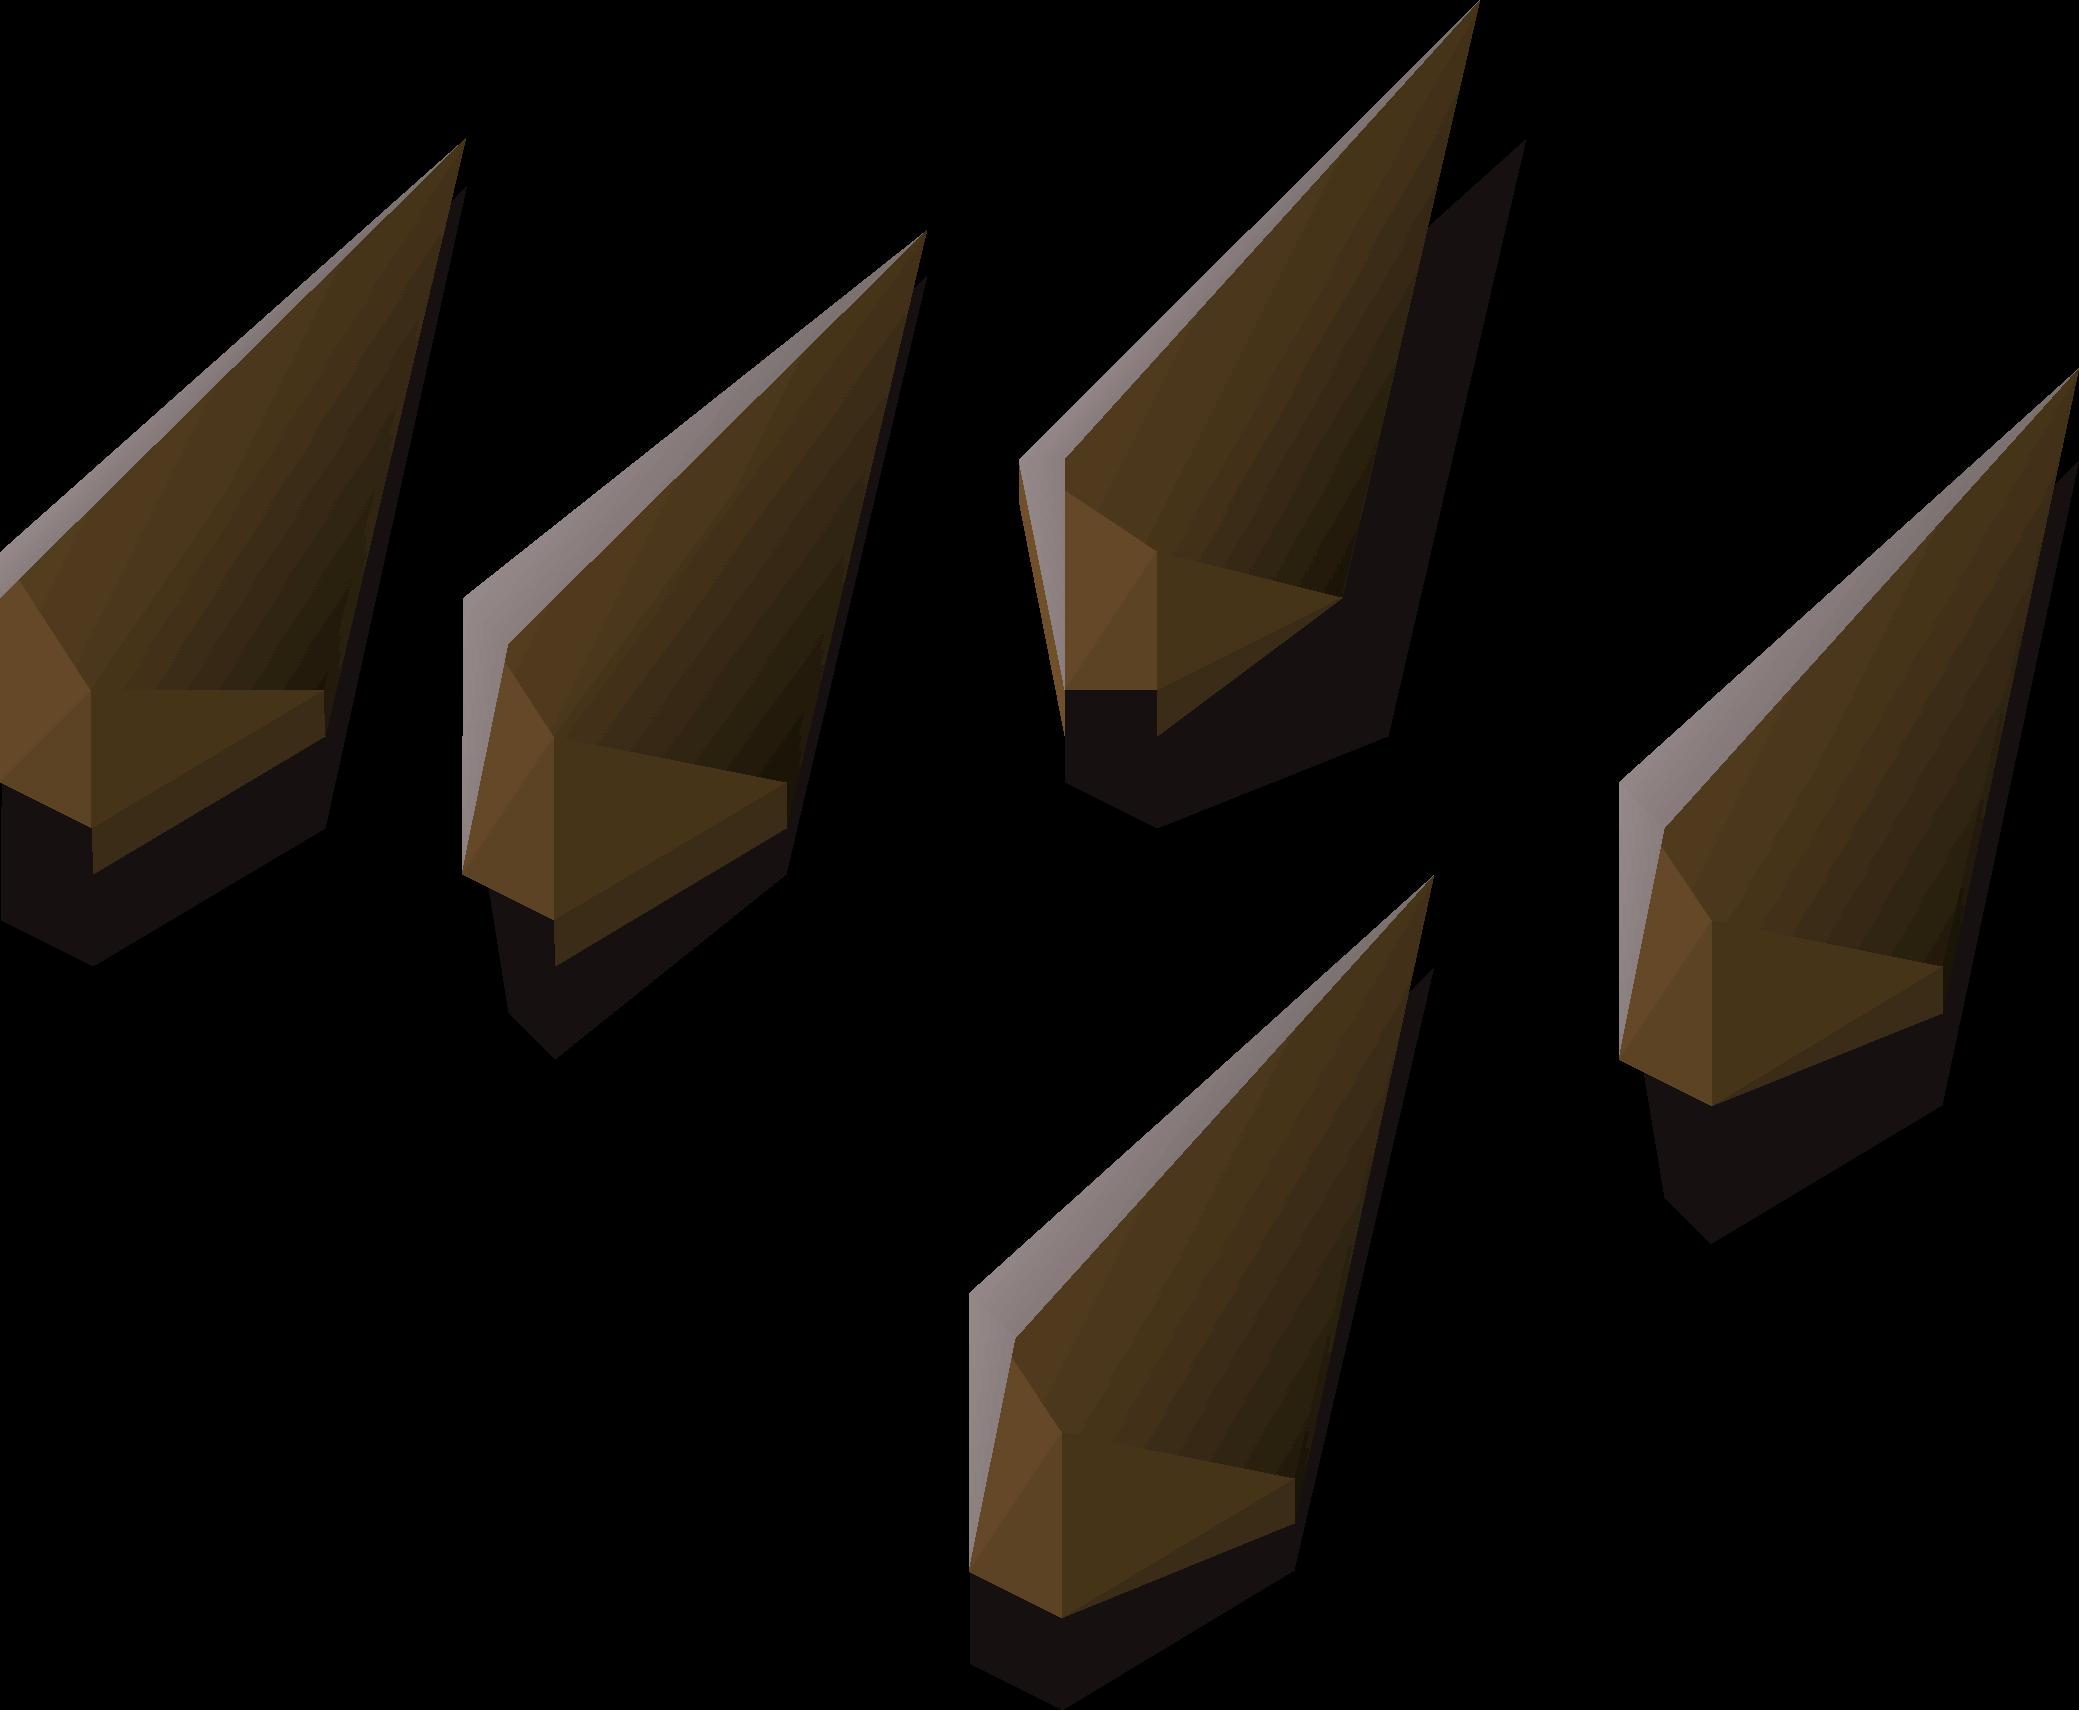 Bronze arrowtips